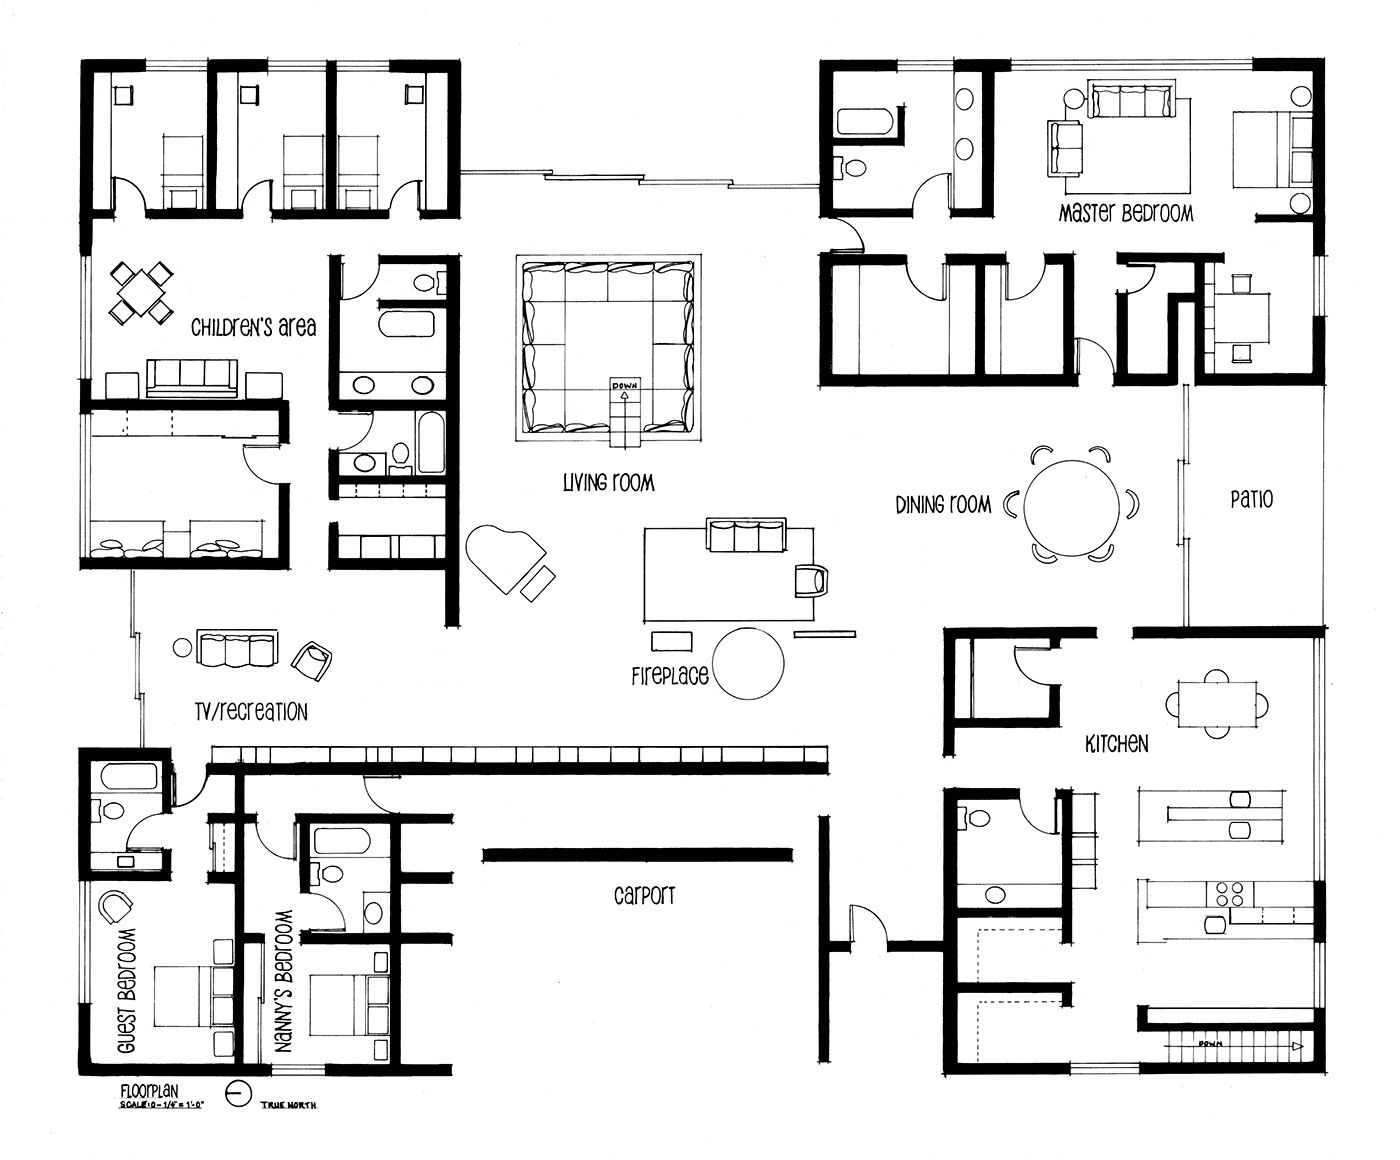 using 1950s blueprints i recreated and hand drafted eero saarinen s